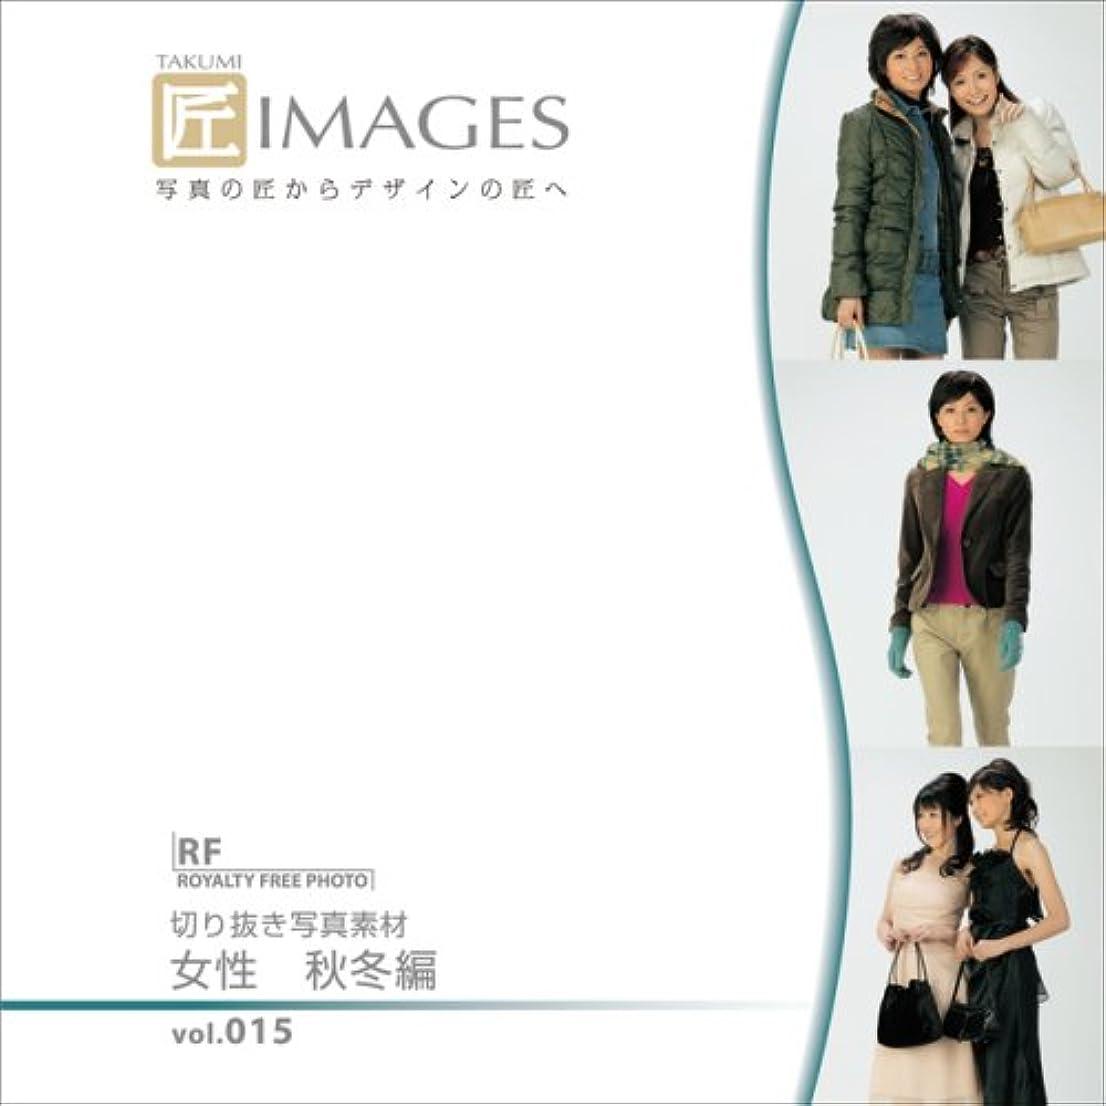 ラフ睡眠鮫売上高匠IMAGES Vol.015 女性 秋冬編